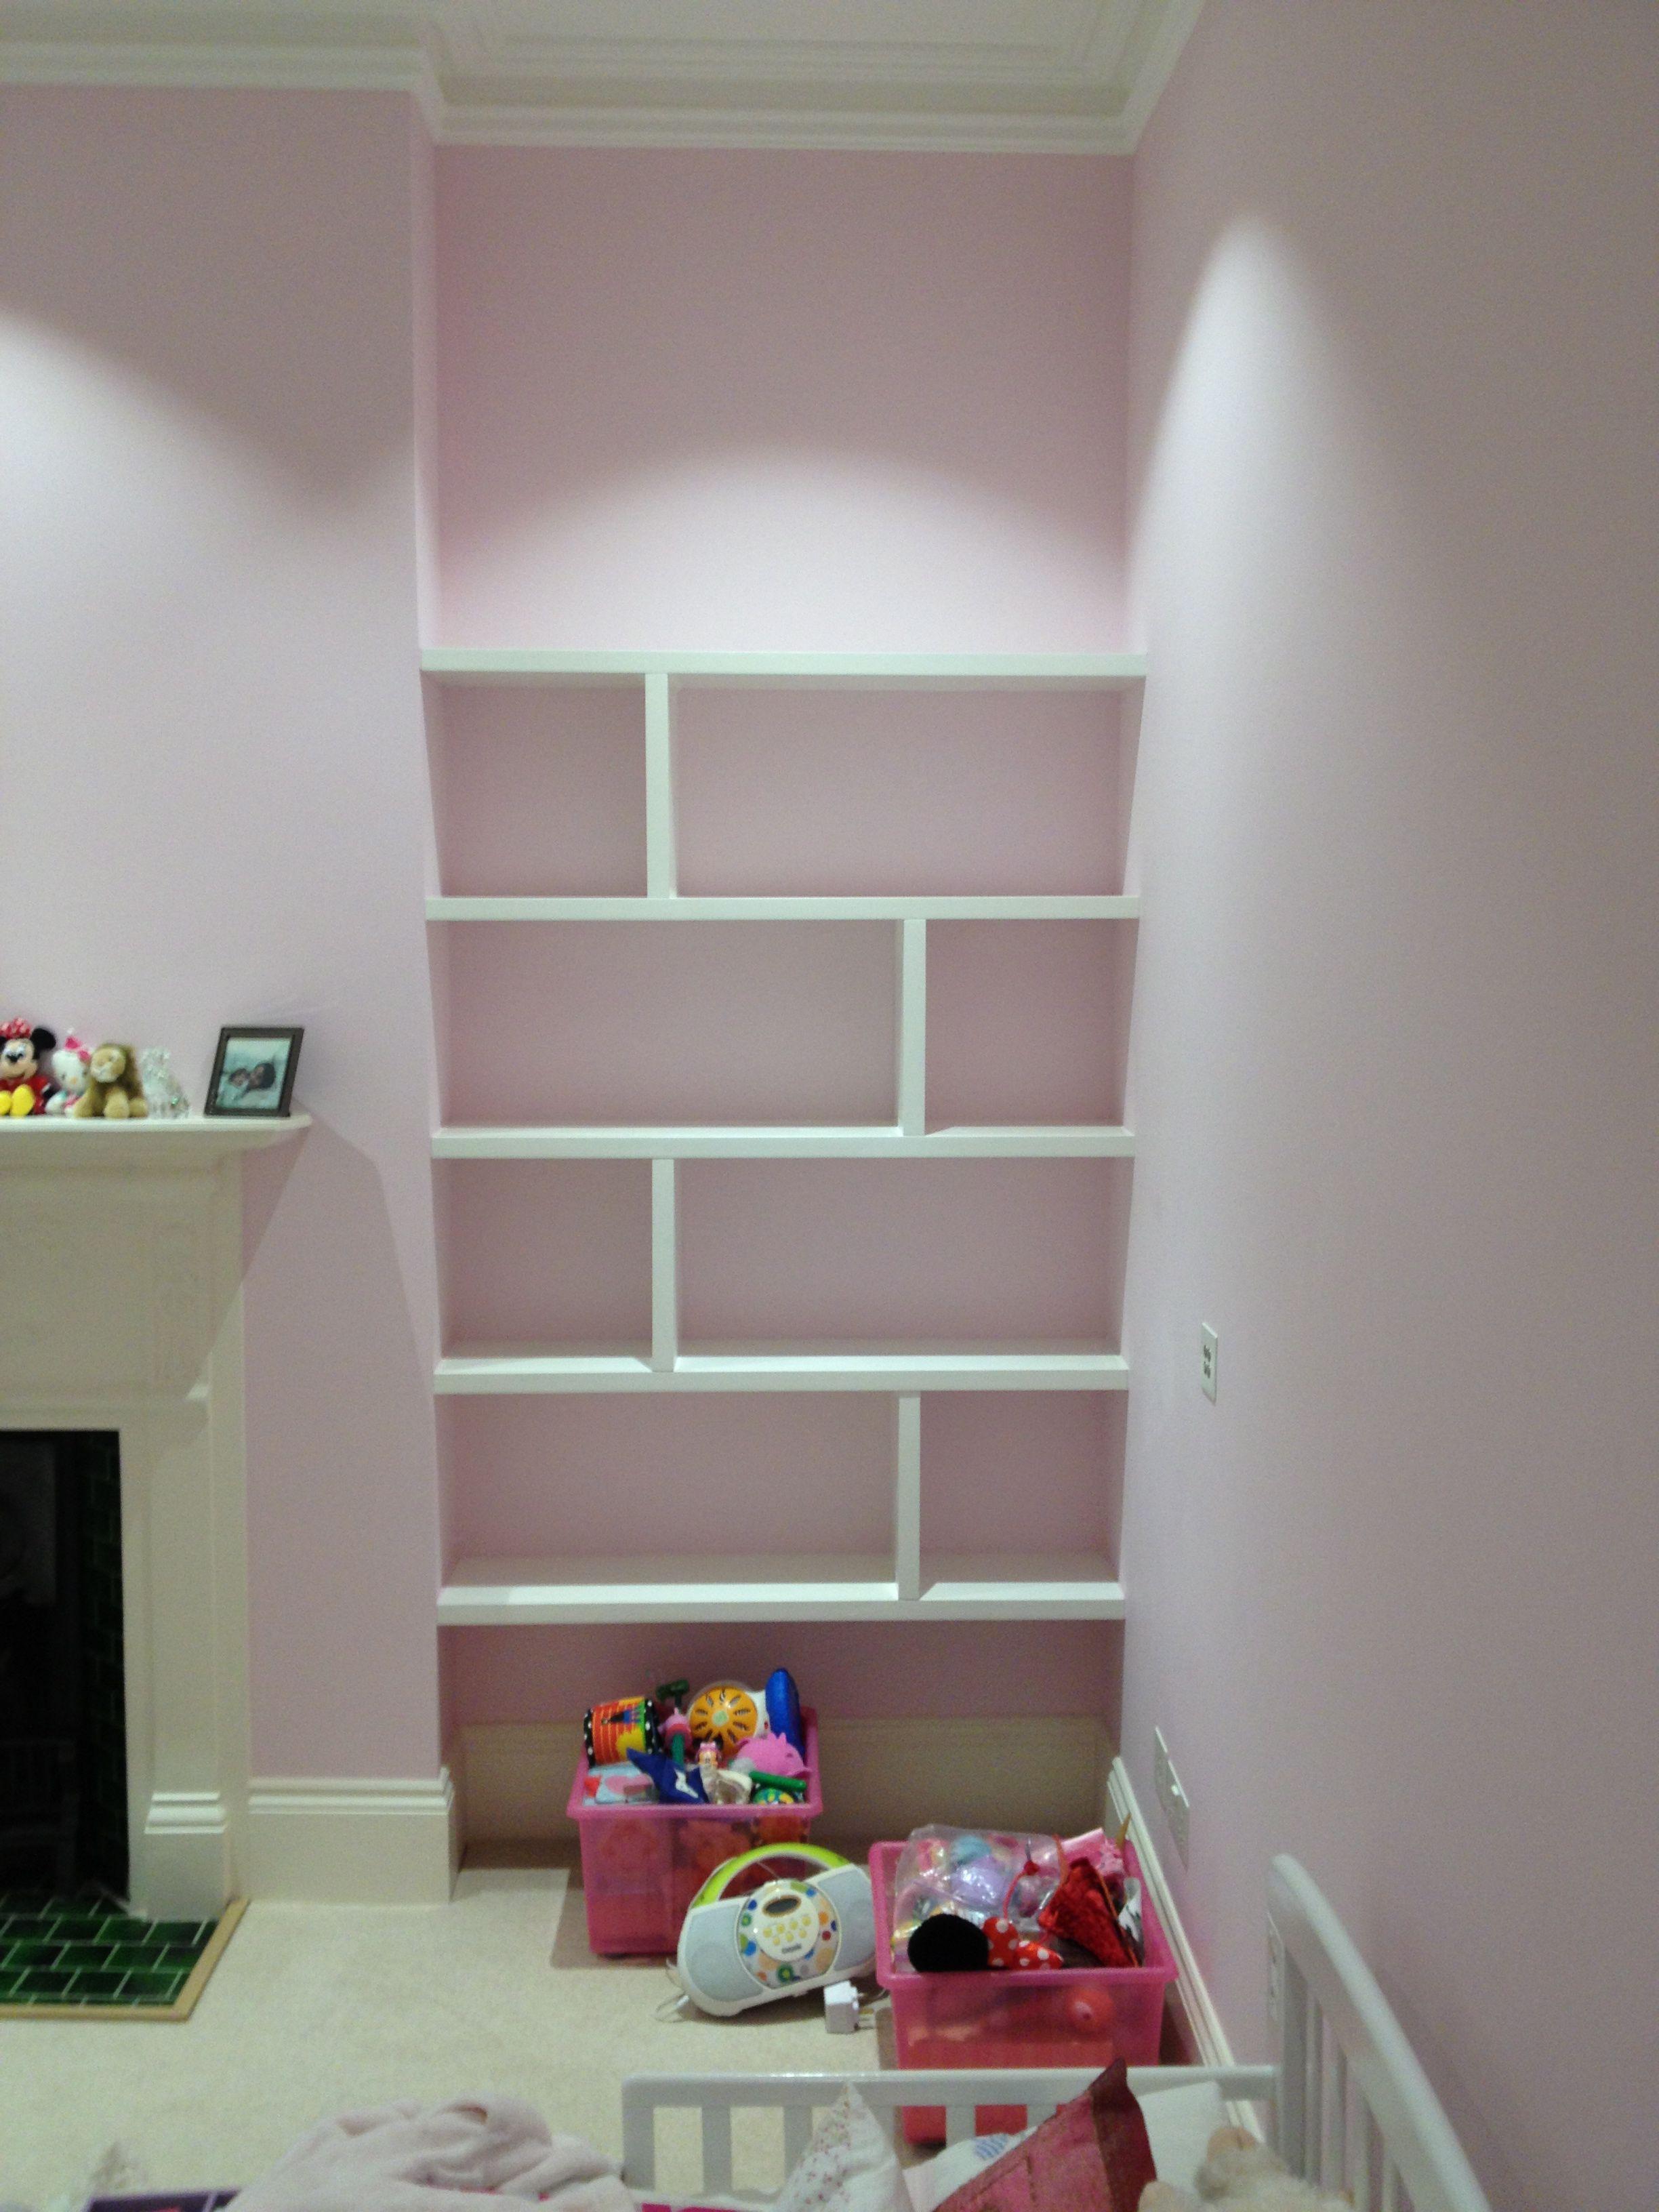 alcove shelving attics alcoves alcove shelving. Black Bedroom Furniture Sets. Home Design Ideas